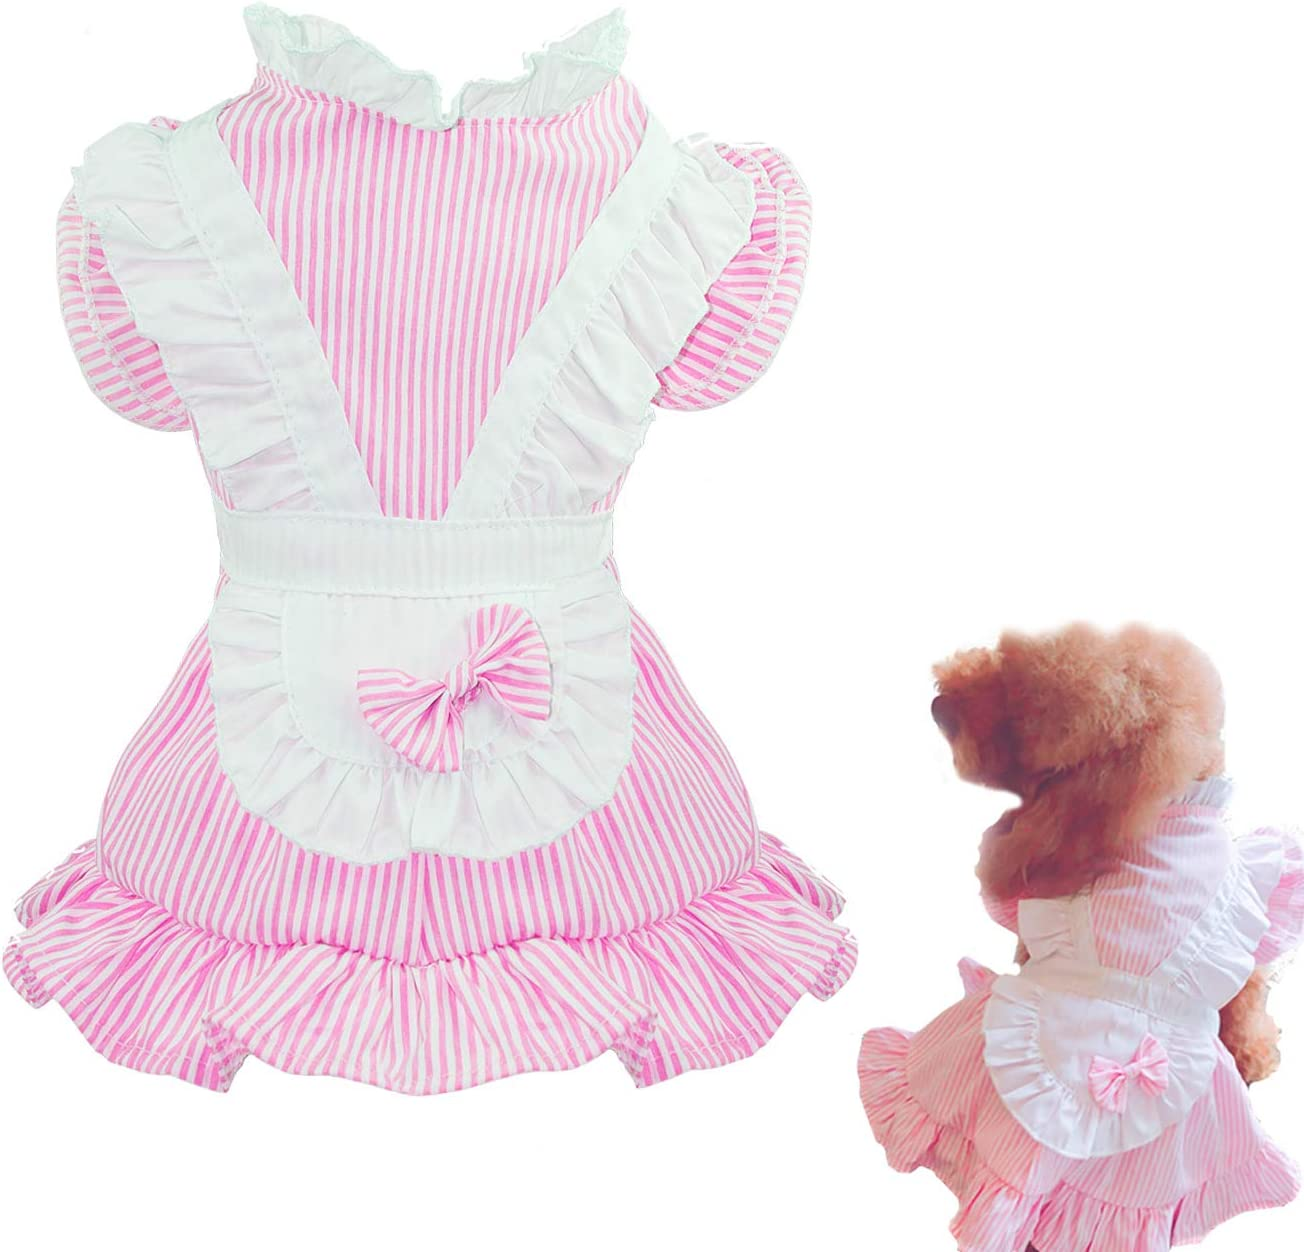 Puppy Face Popular overseas Dog Max 70% OFF Tutu Dress Girl Medium for Clothes Do Small